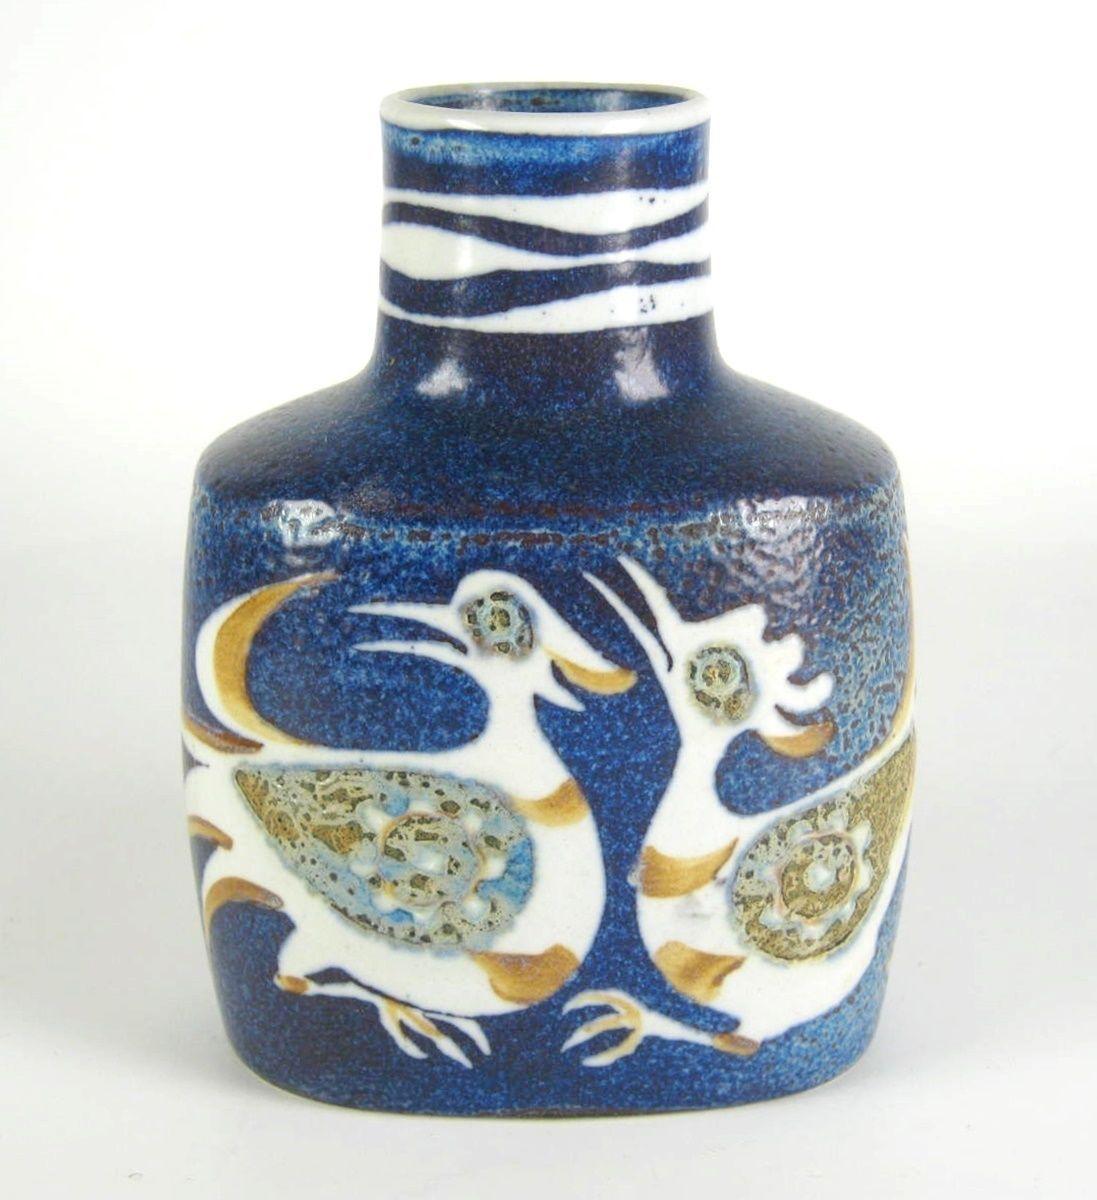 Royal Copenhagen Fajance Vase Nils Thorsson Design Pottery Vintage Denmark 13cm